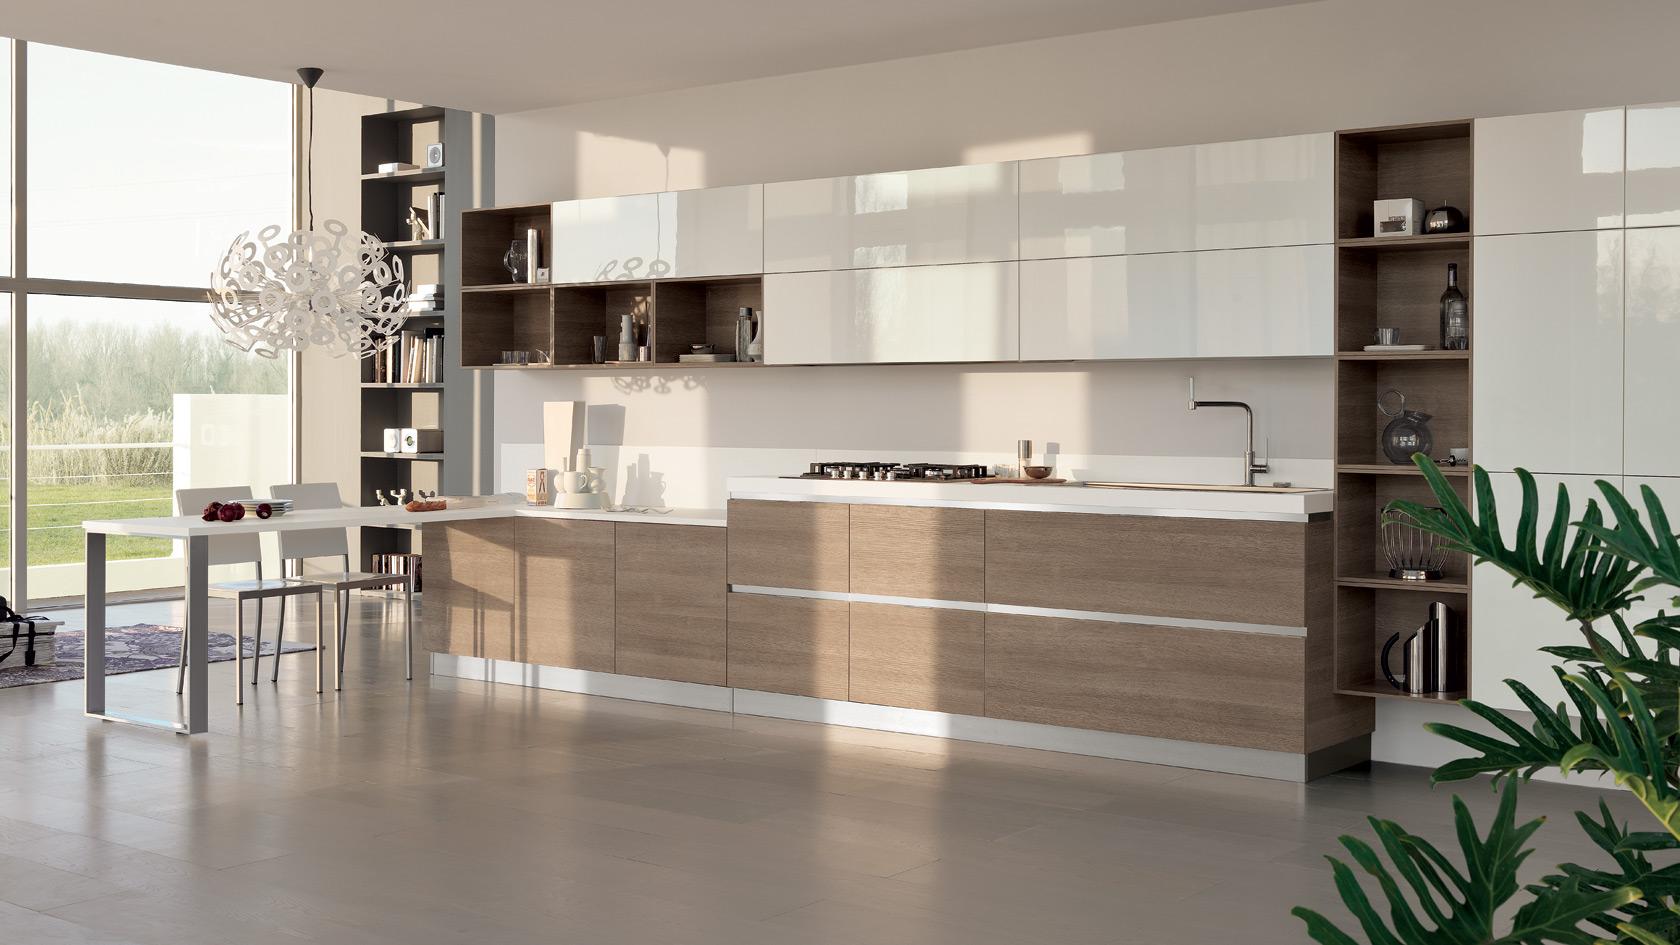 Best Cucine Scavolini Opinioni Images - Ideas & Design 2017 ...